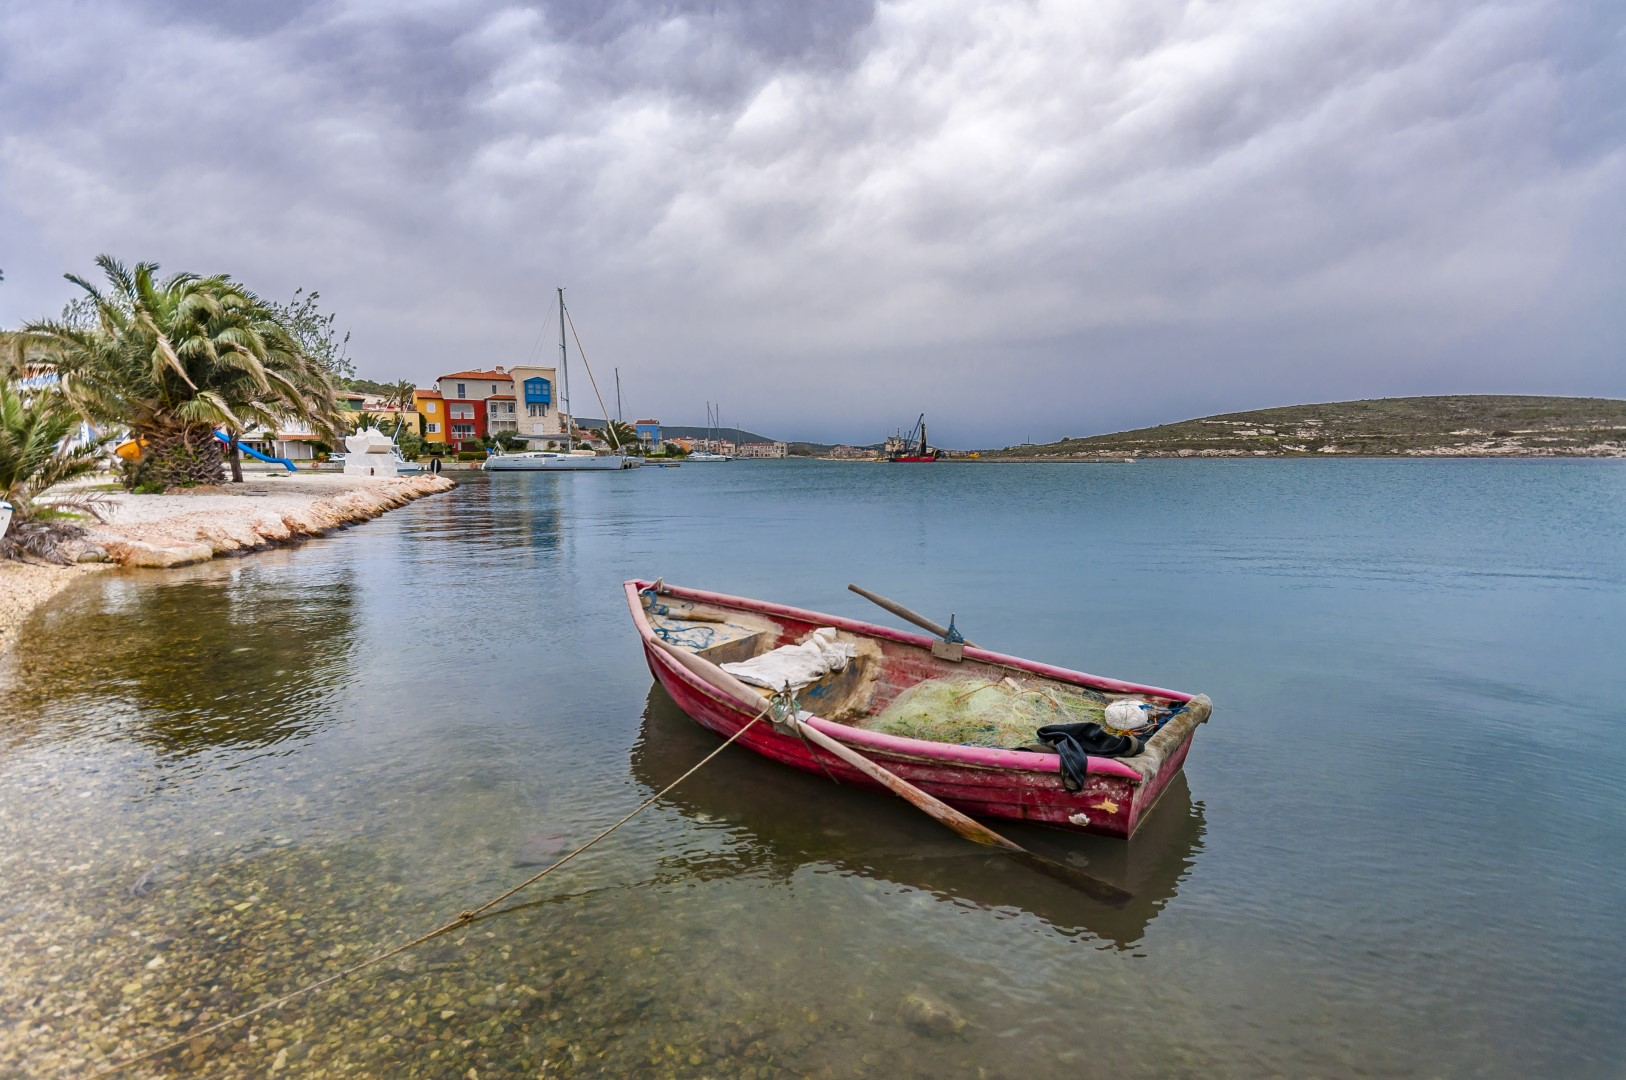 Turkey_Izmir_Alacati_port